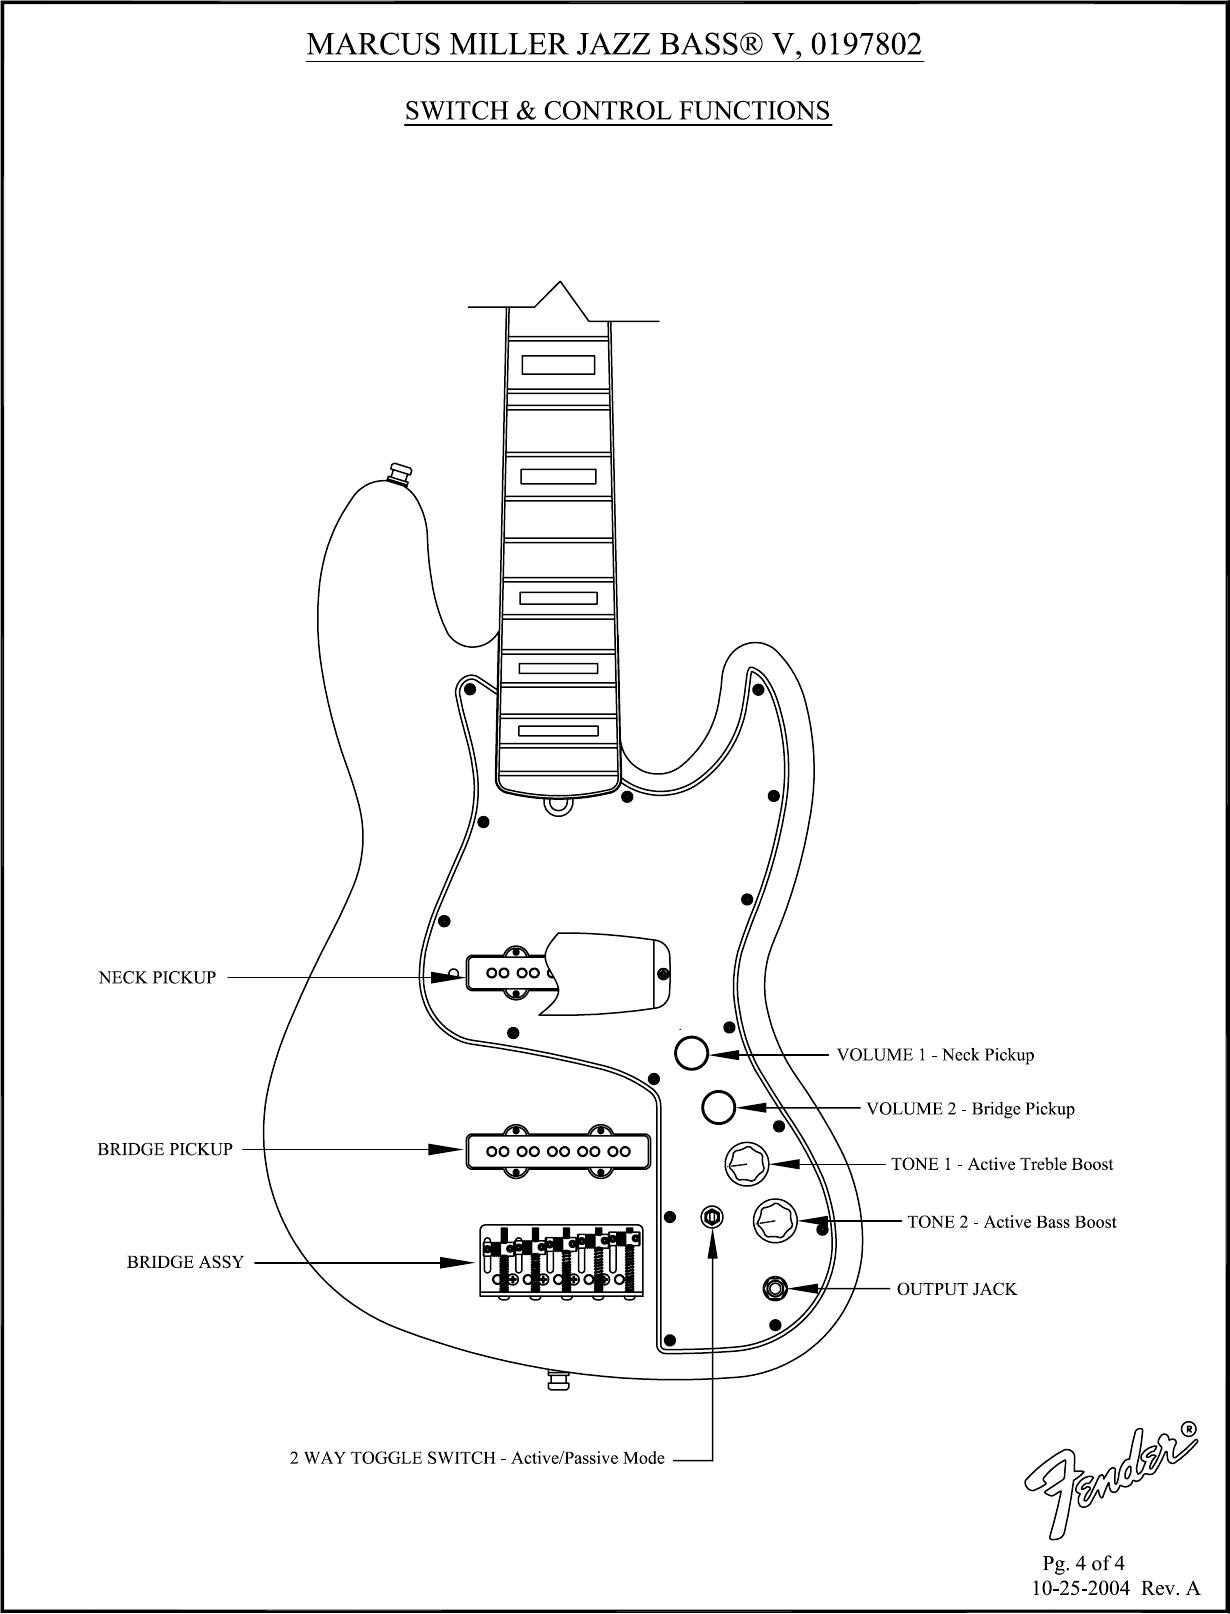 Fender Marcus Miller Jazz Bass Users Manual Sd 019 J